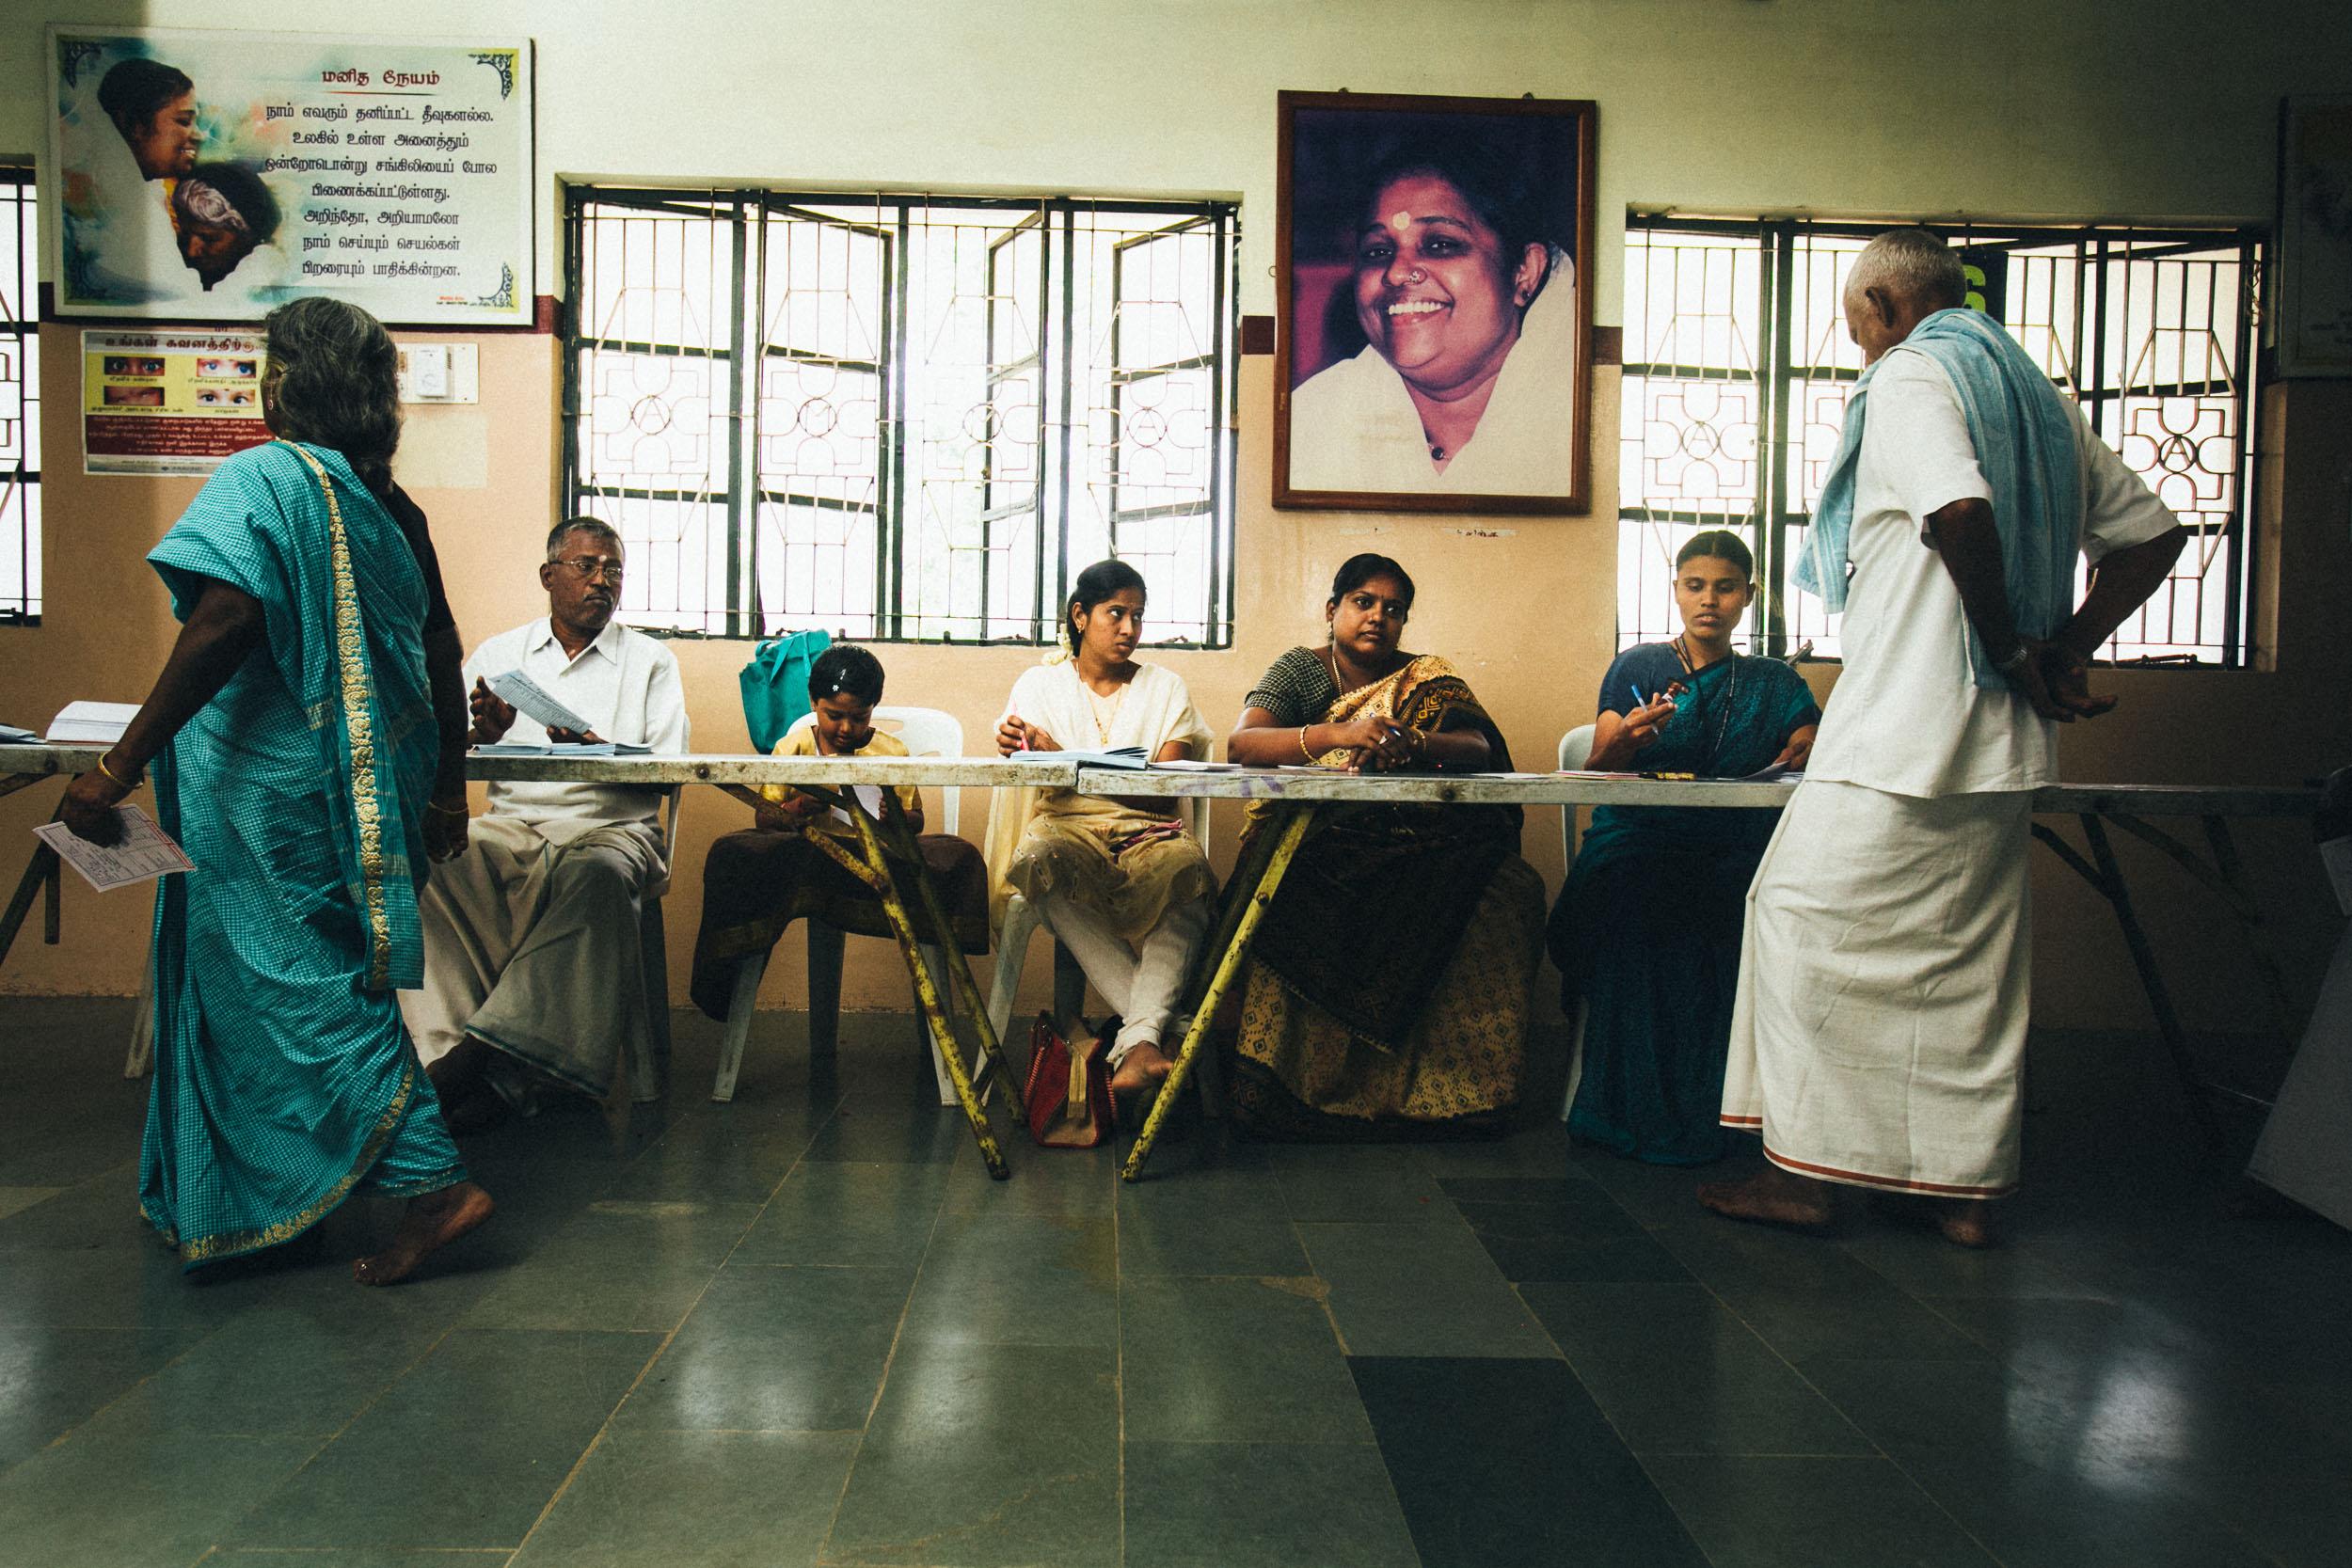 brian-callaway-india-photography-aravind-eye-hospital-17.jpg